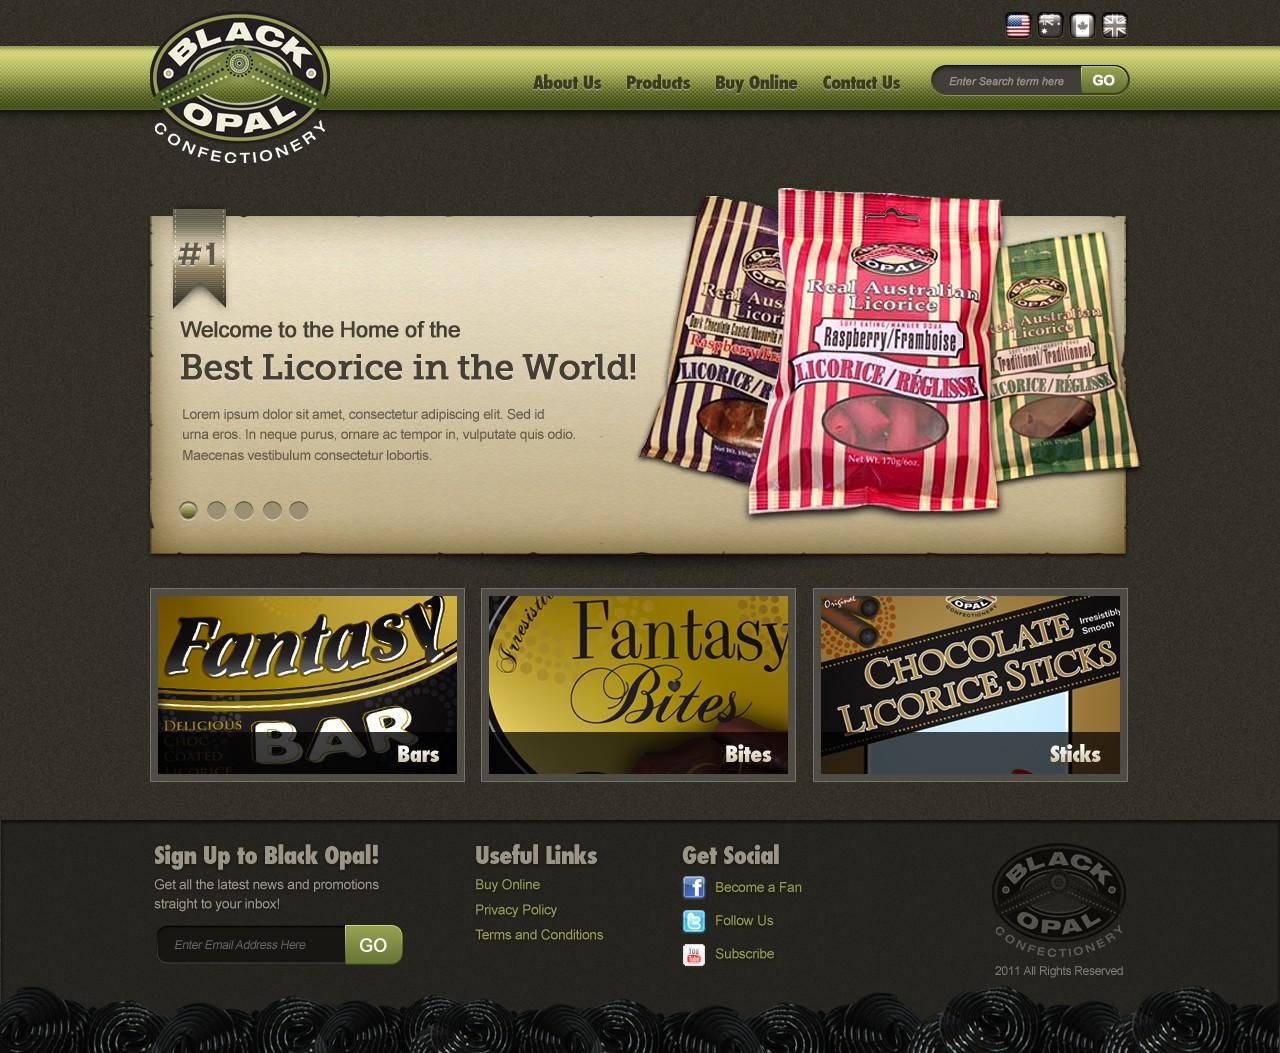 Black Opal Confectionery needs a new website design